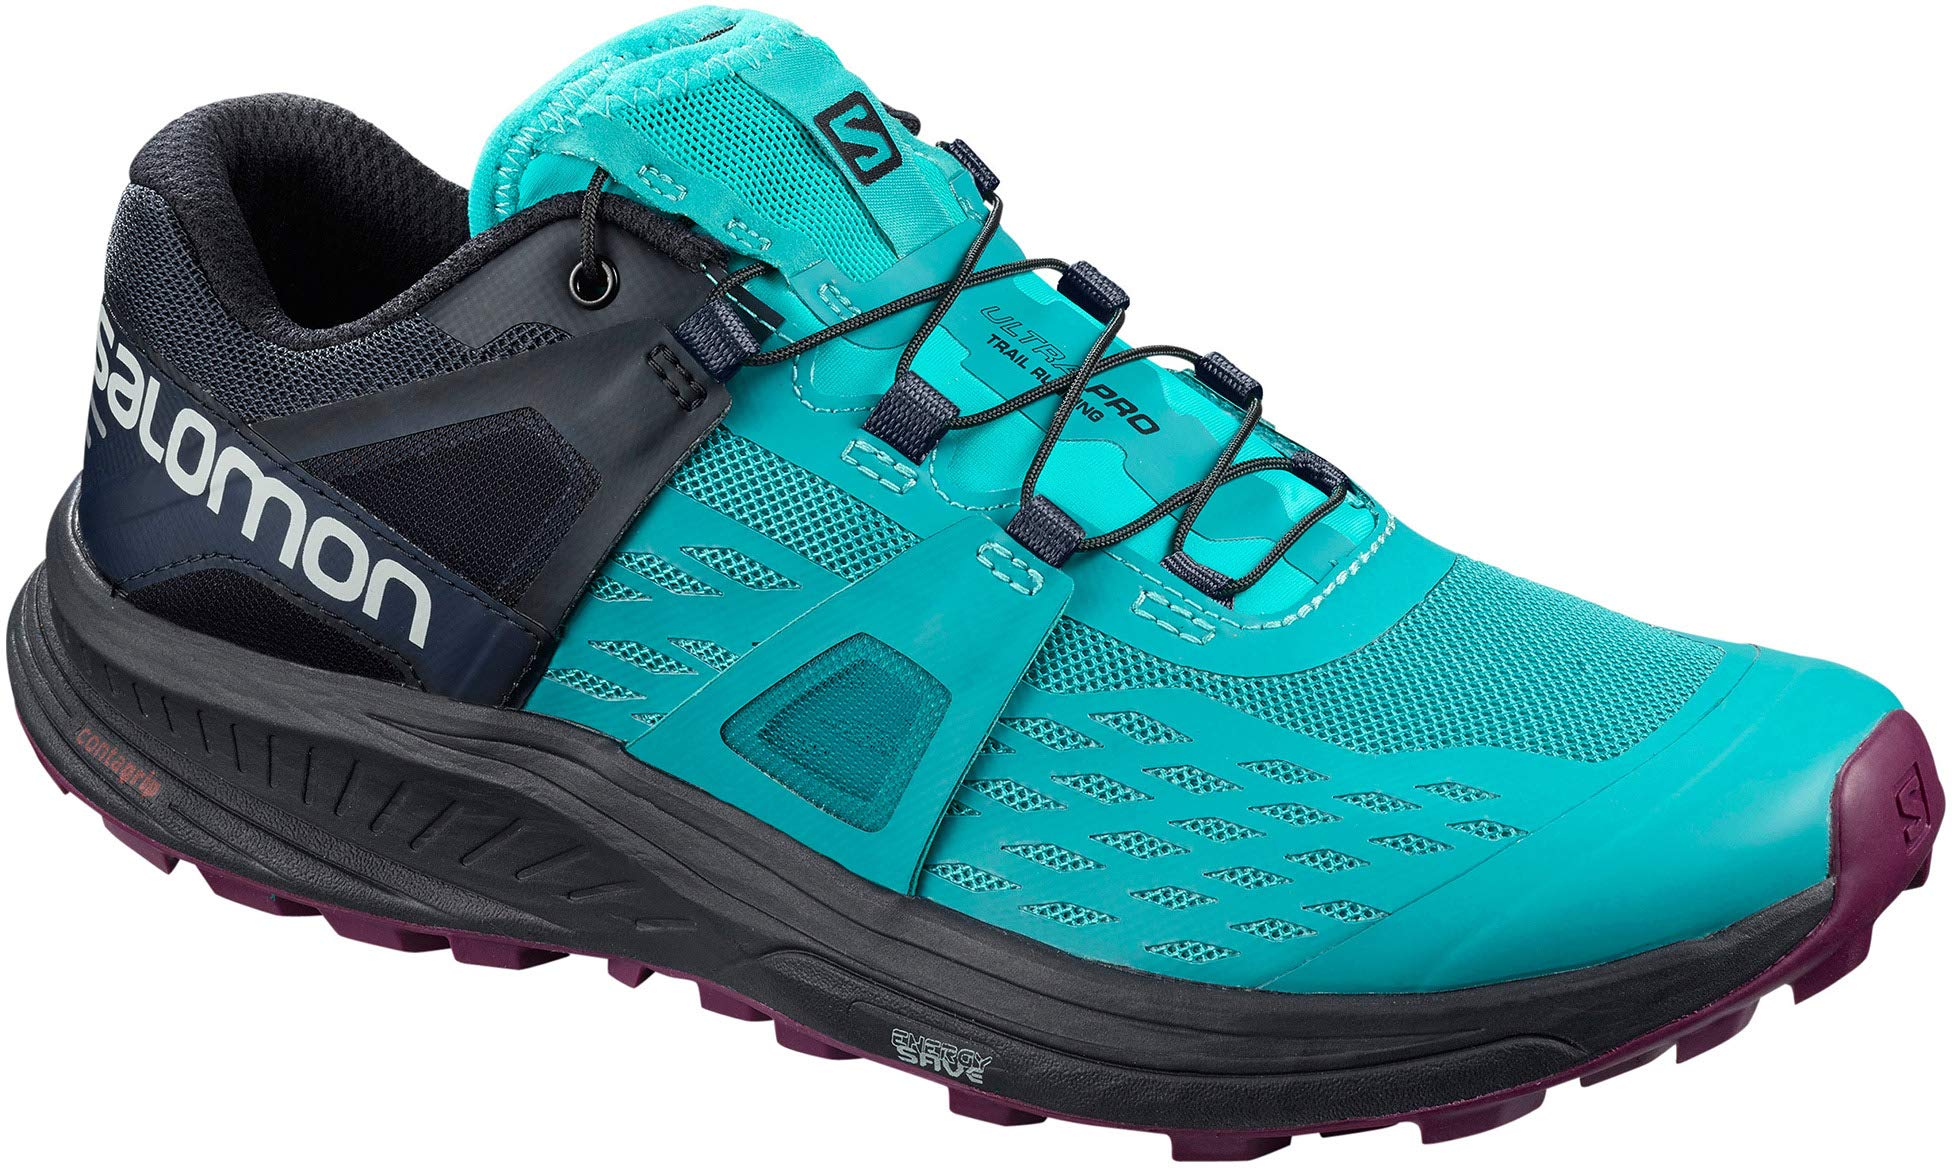 SALOMON Ultra Pro Trail Running Shoes Womens Sz 8 Tile Blue/Navy/Dark Purple by SALOMON